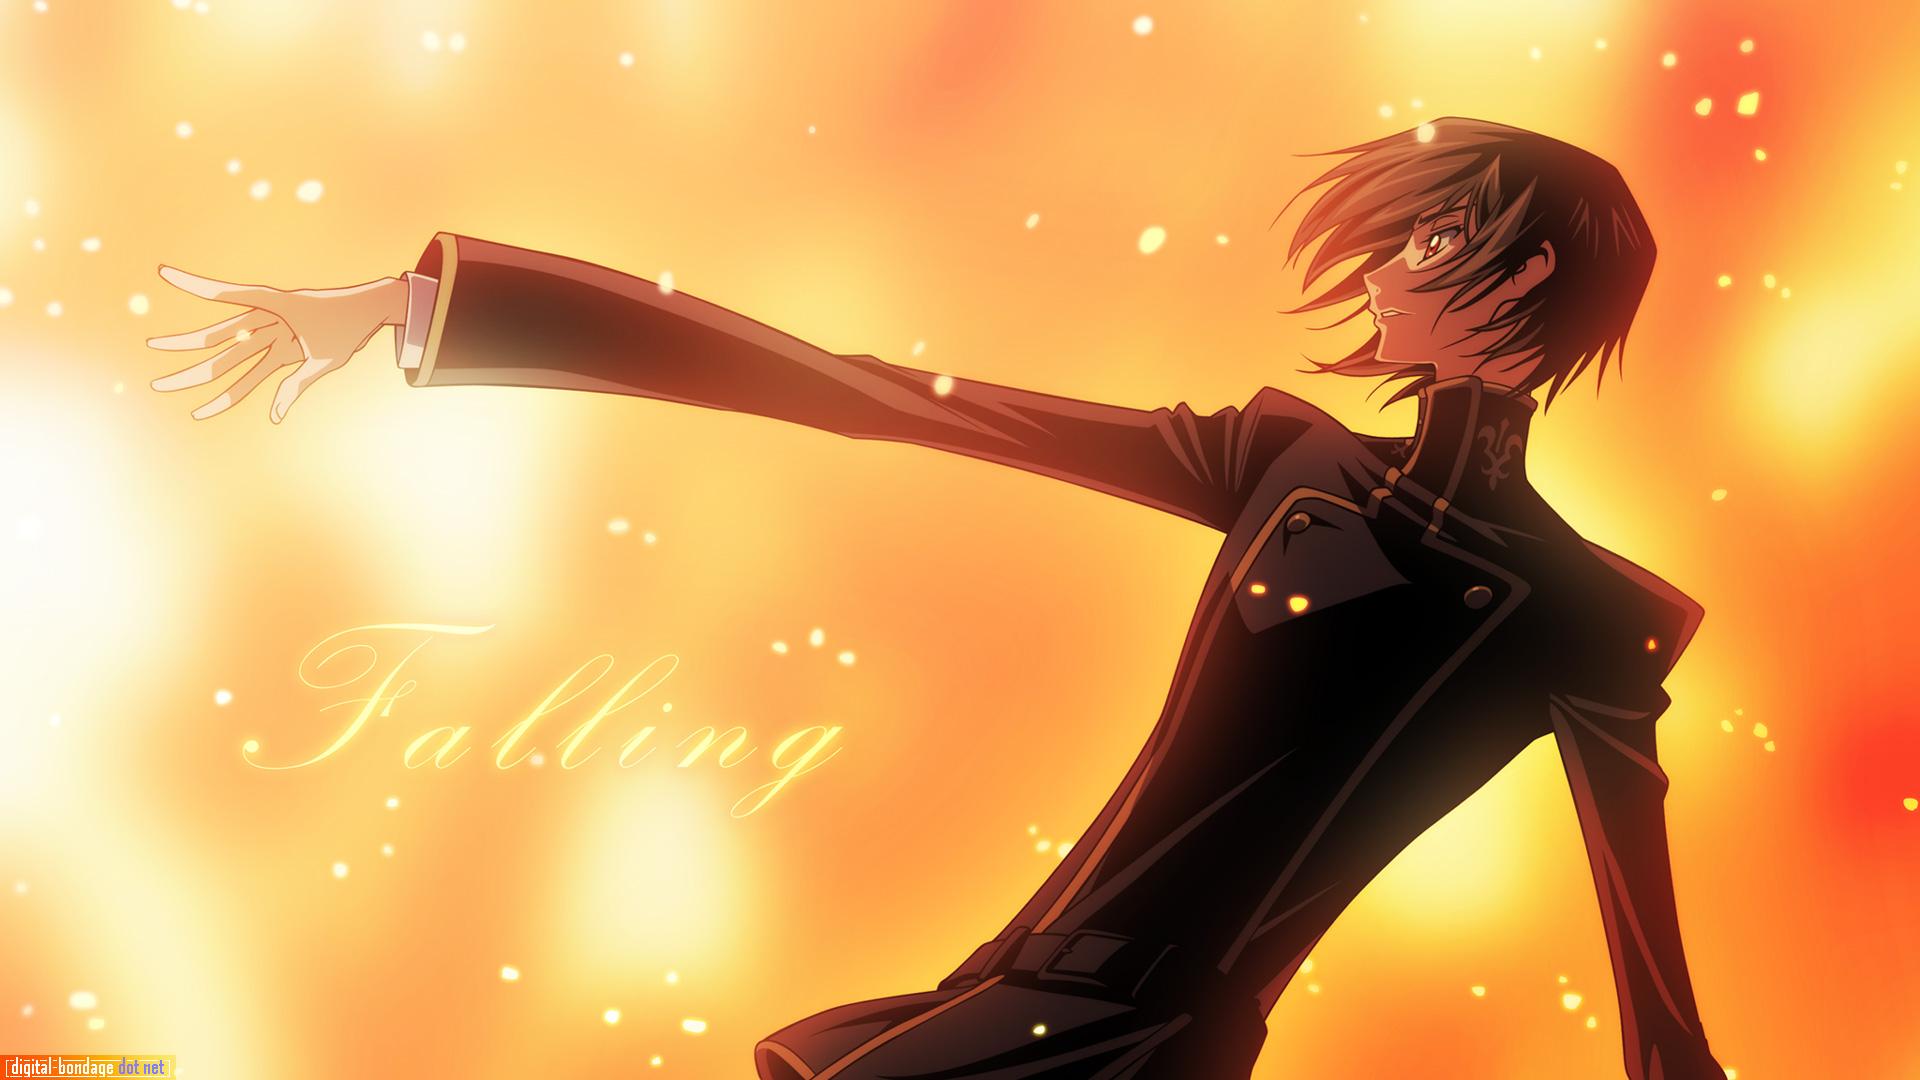 Wallpaper - Anime Person Falling Backwards - 10x10 Wallpaper